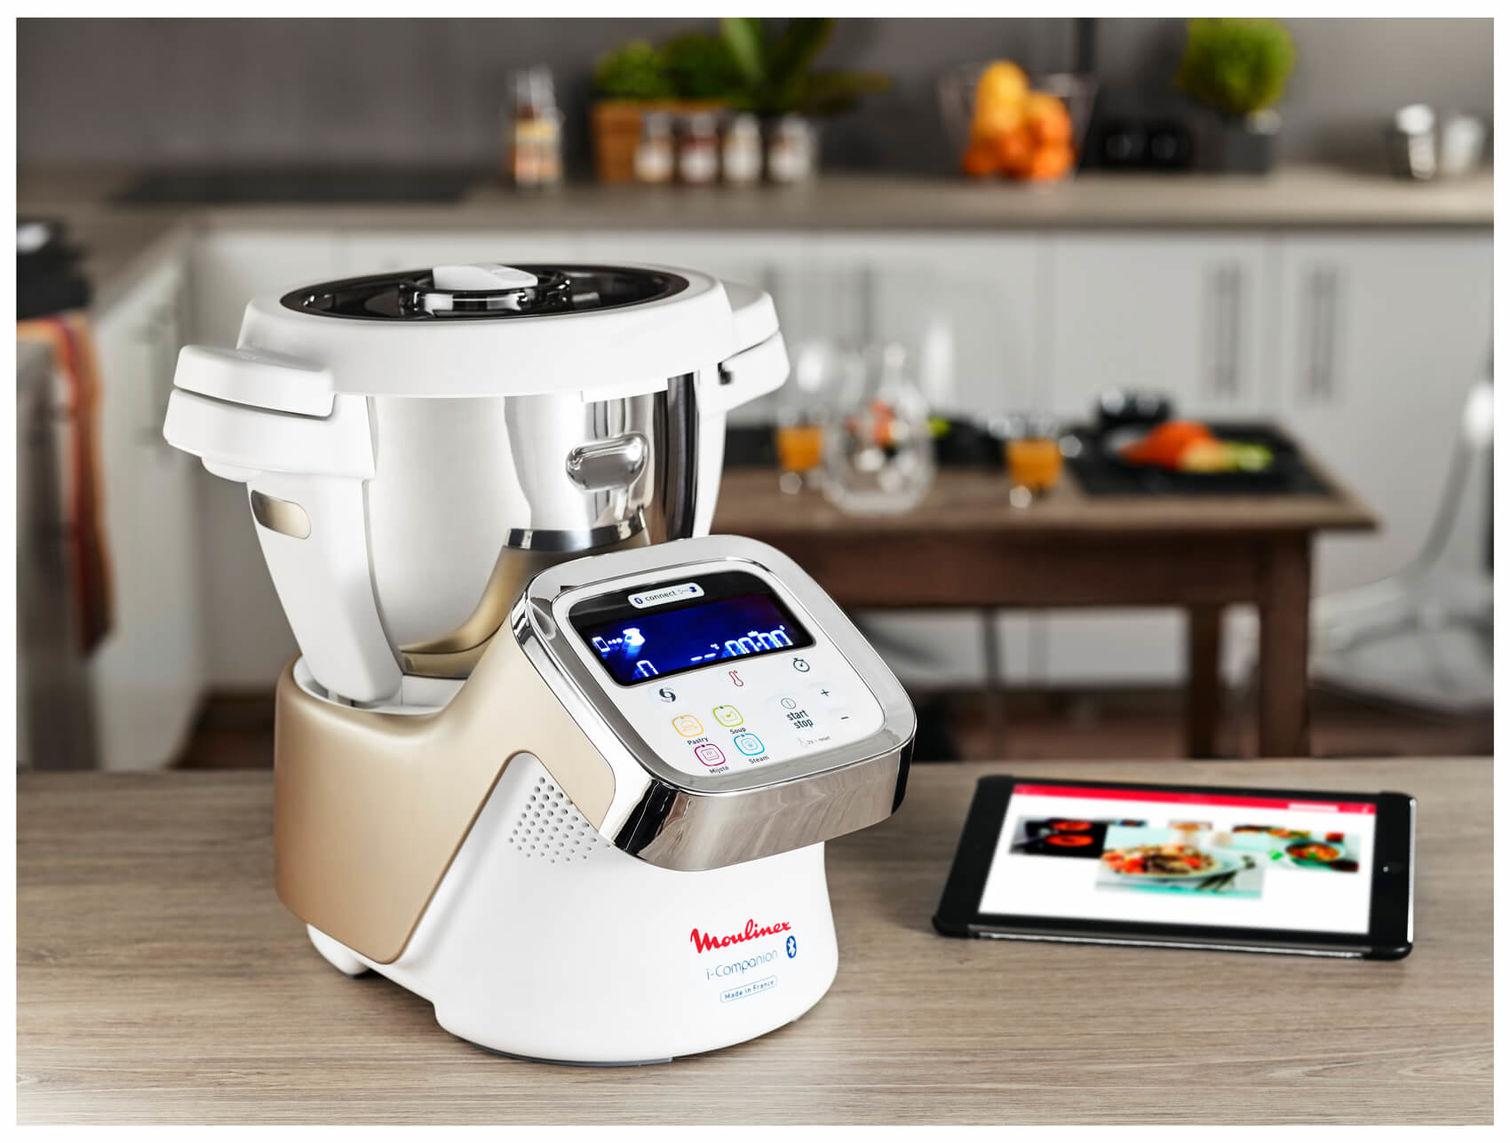 Moulinex I Companion Hf900110 Kitchen Machine